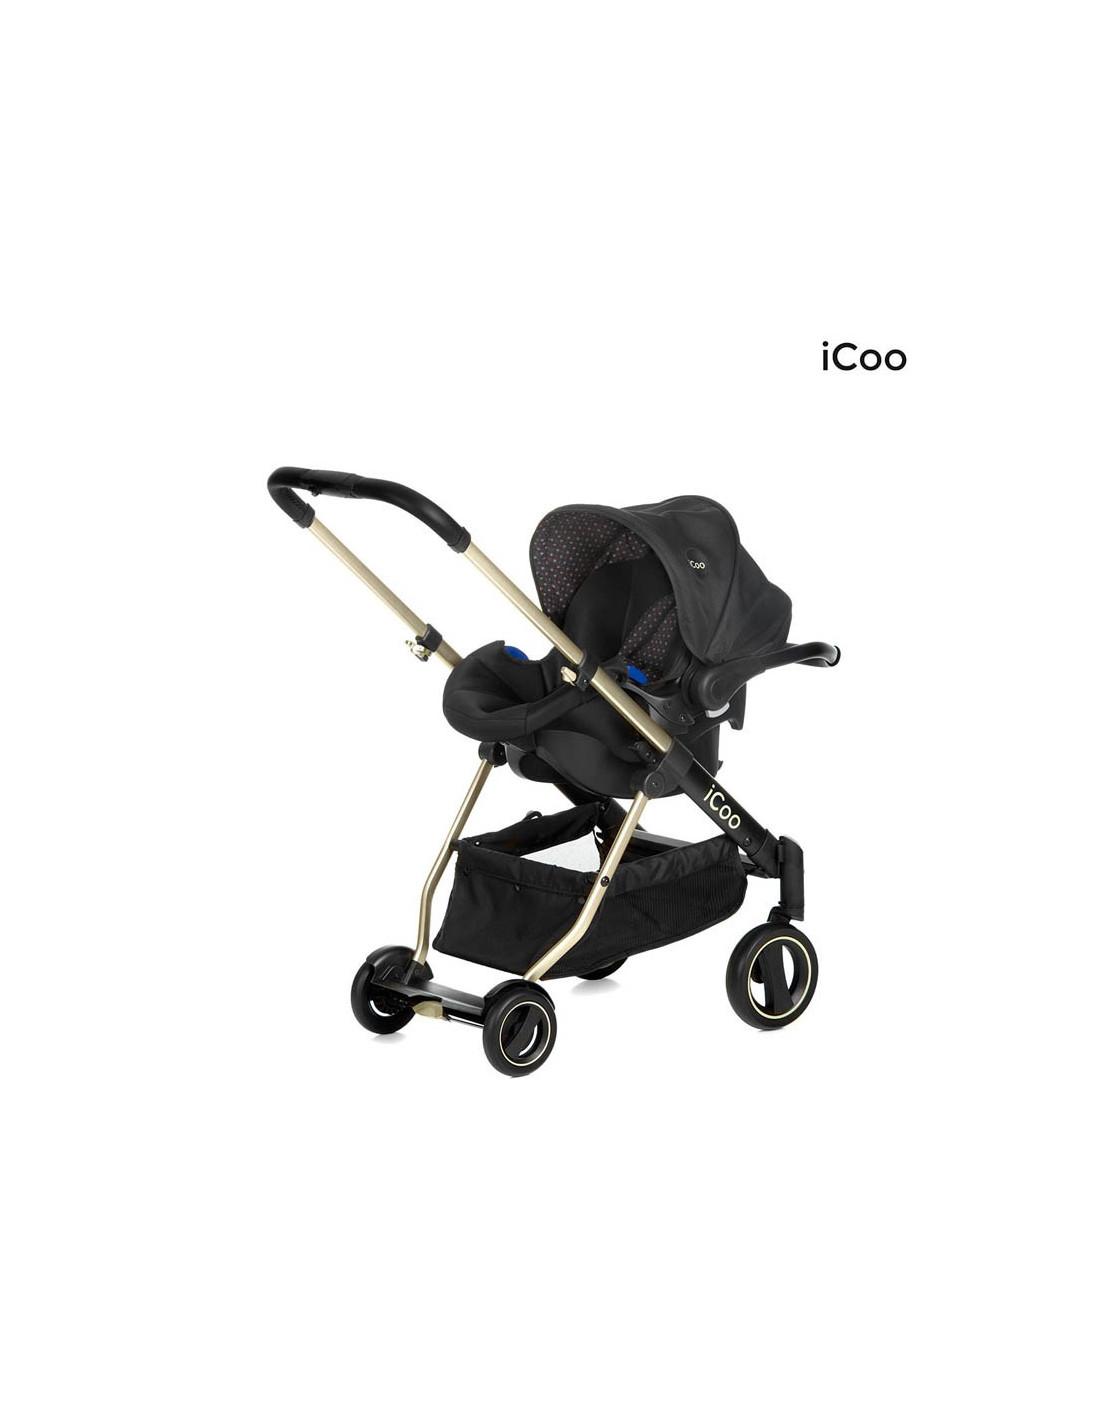 Coche 3 piezas icoo acrota xl plus env o gratis 24 h for Piezas para bebes